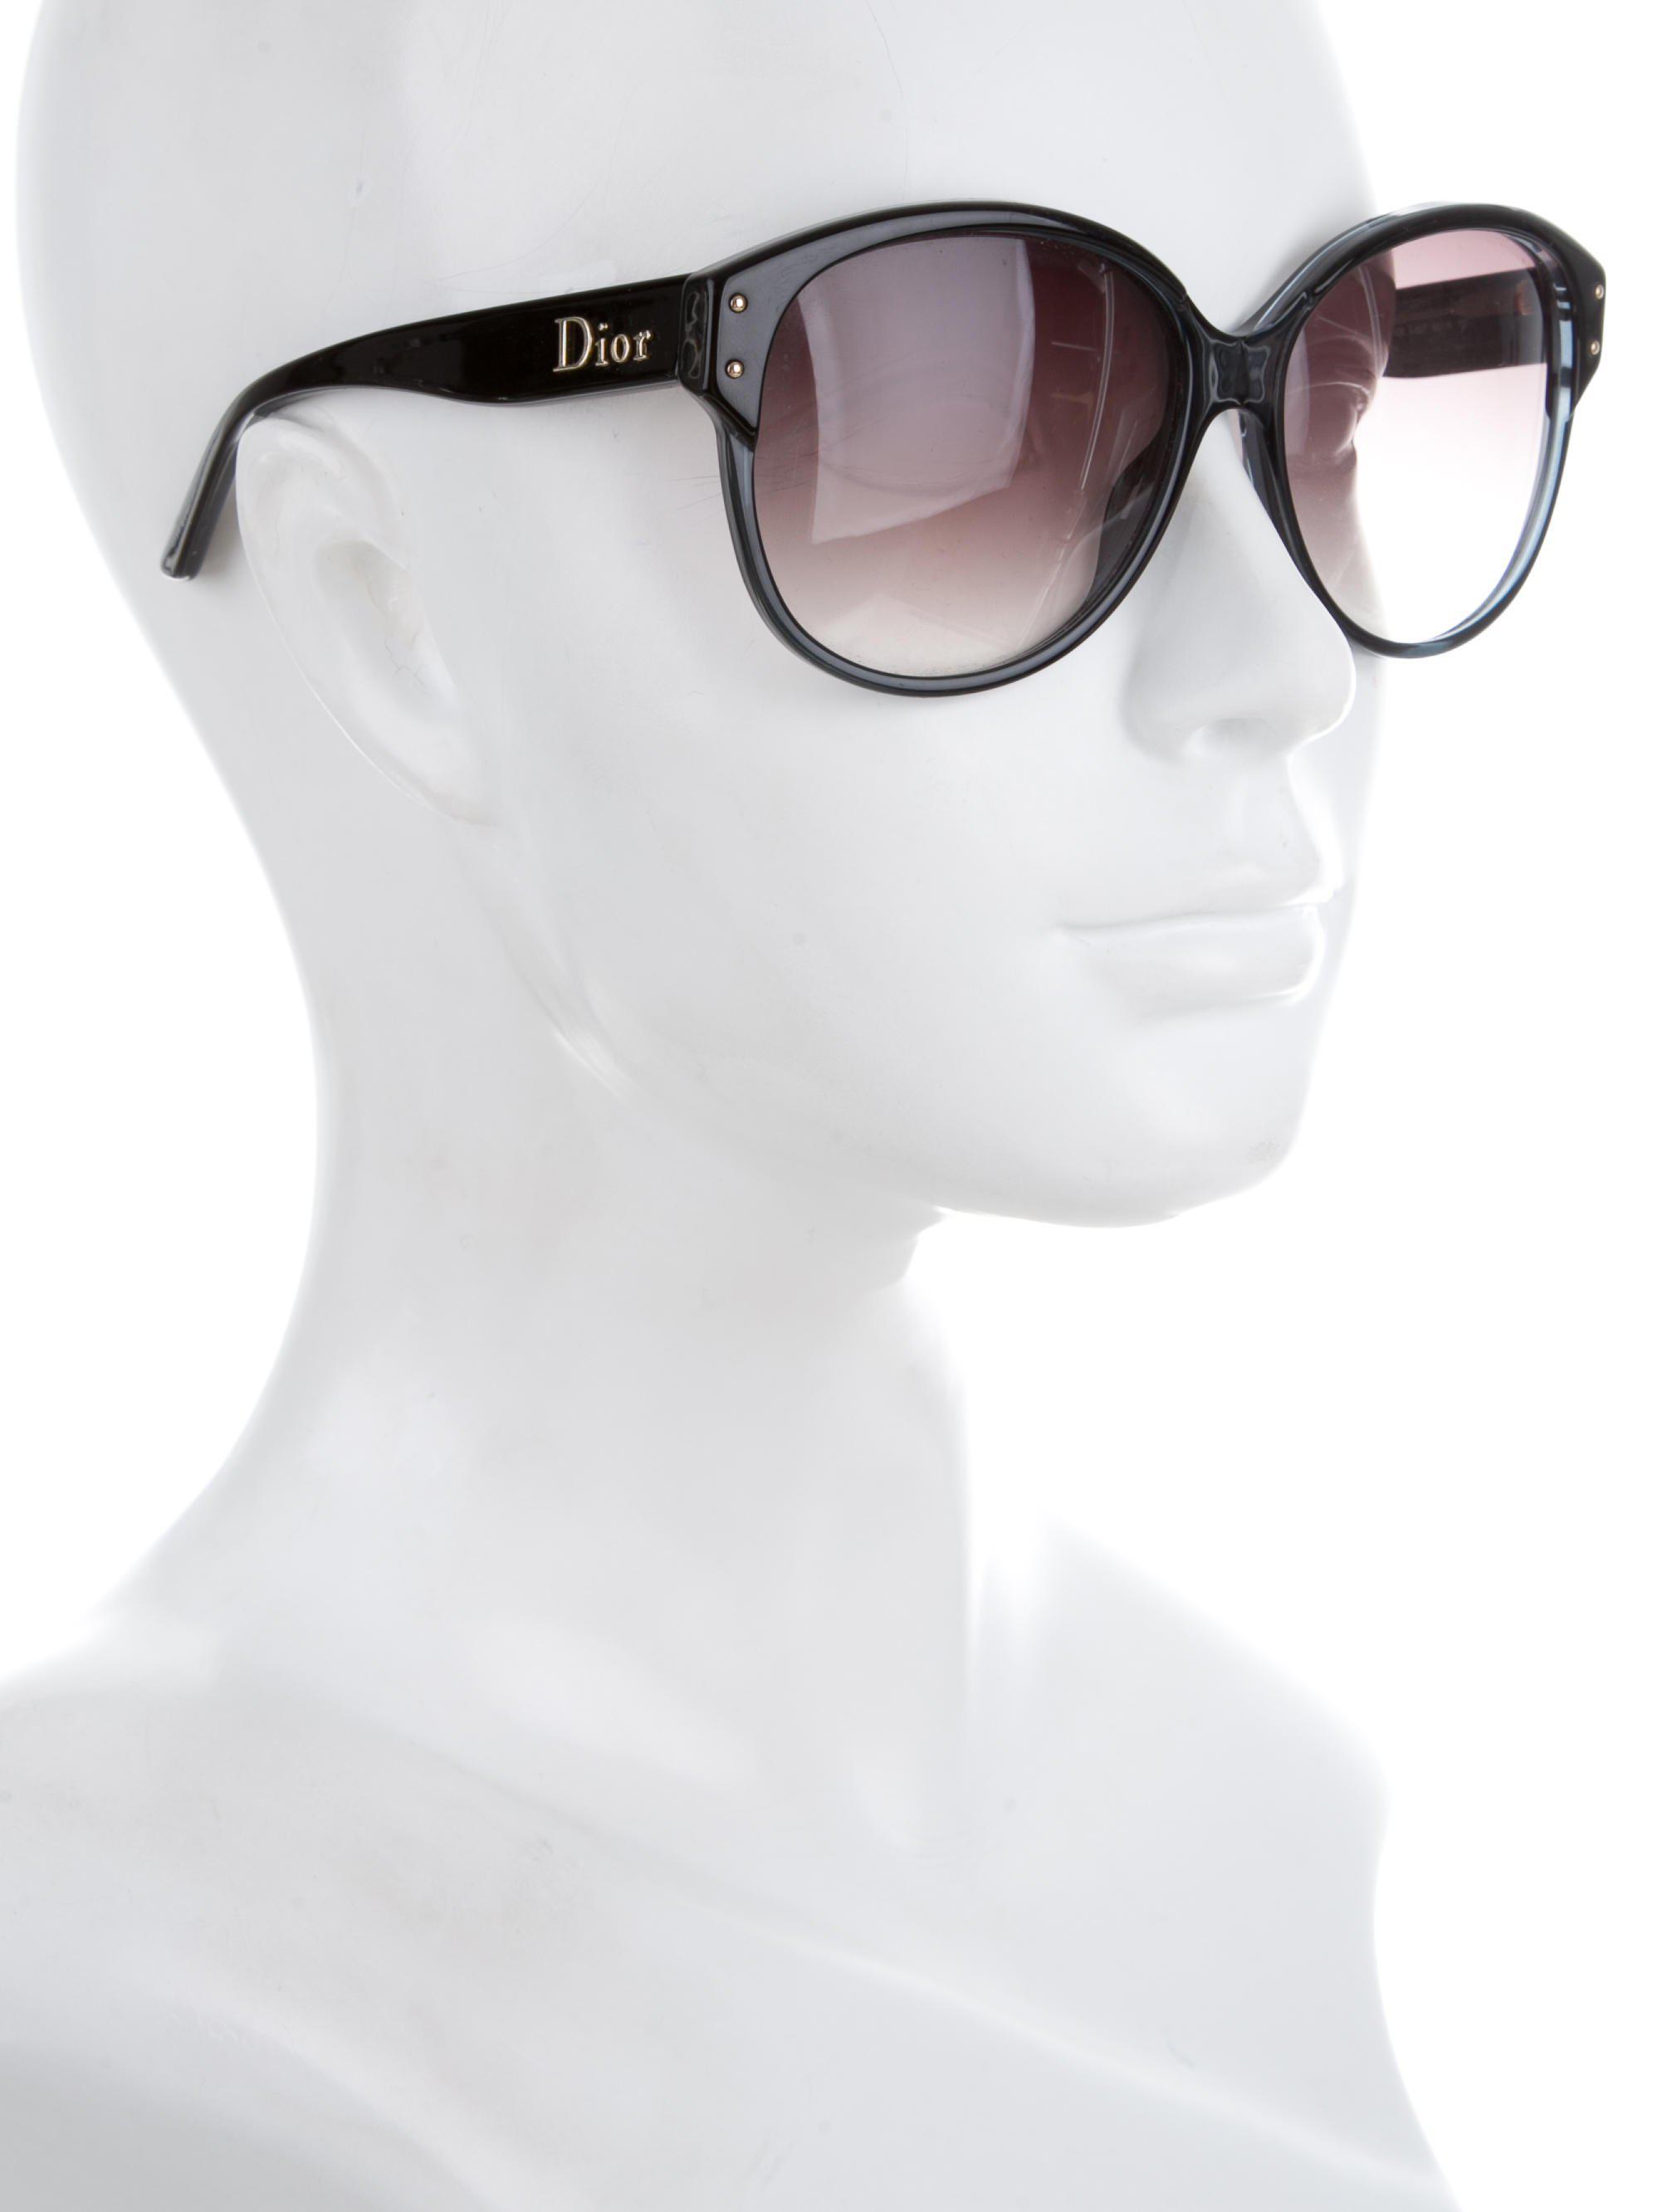 e80f292b707 Lyst - Dior Oversize Tinted Sunglasses Black in Metallic